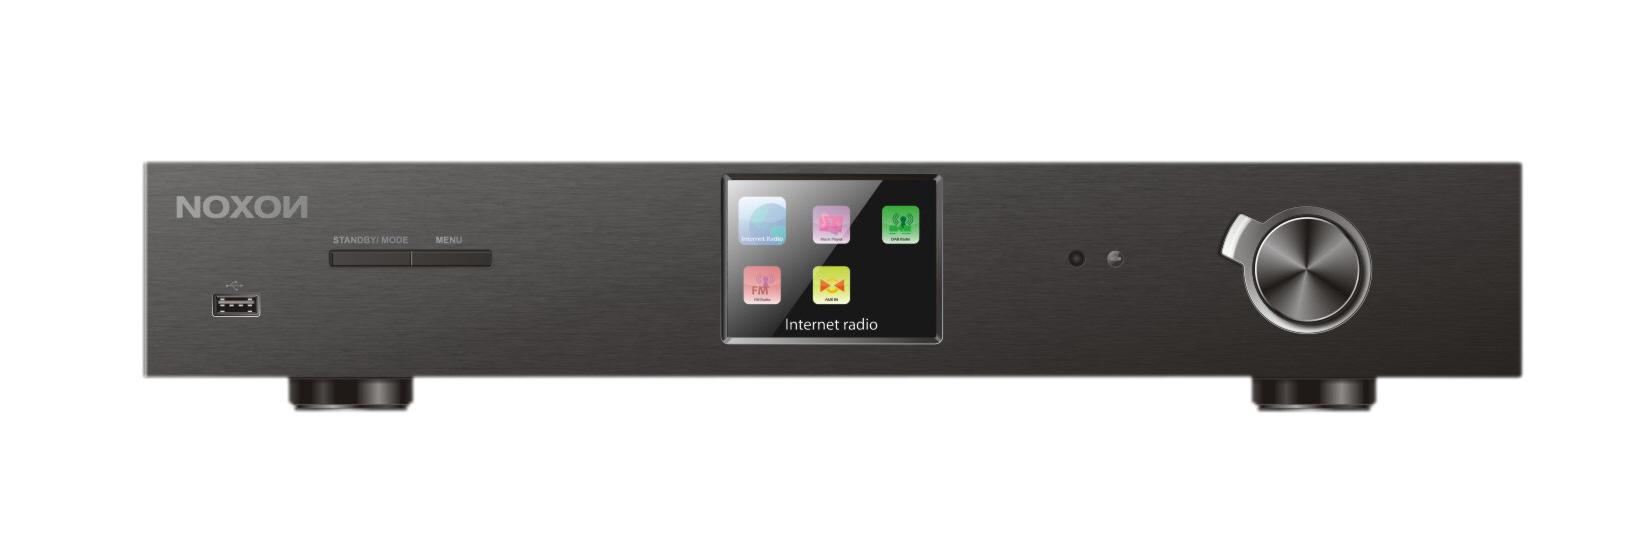 NOXON A570+ HiFi Komponente, Internetradio, DAB/DAB+, UKW Tuner & Spotify